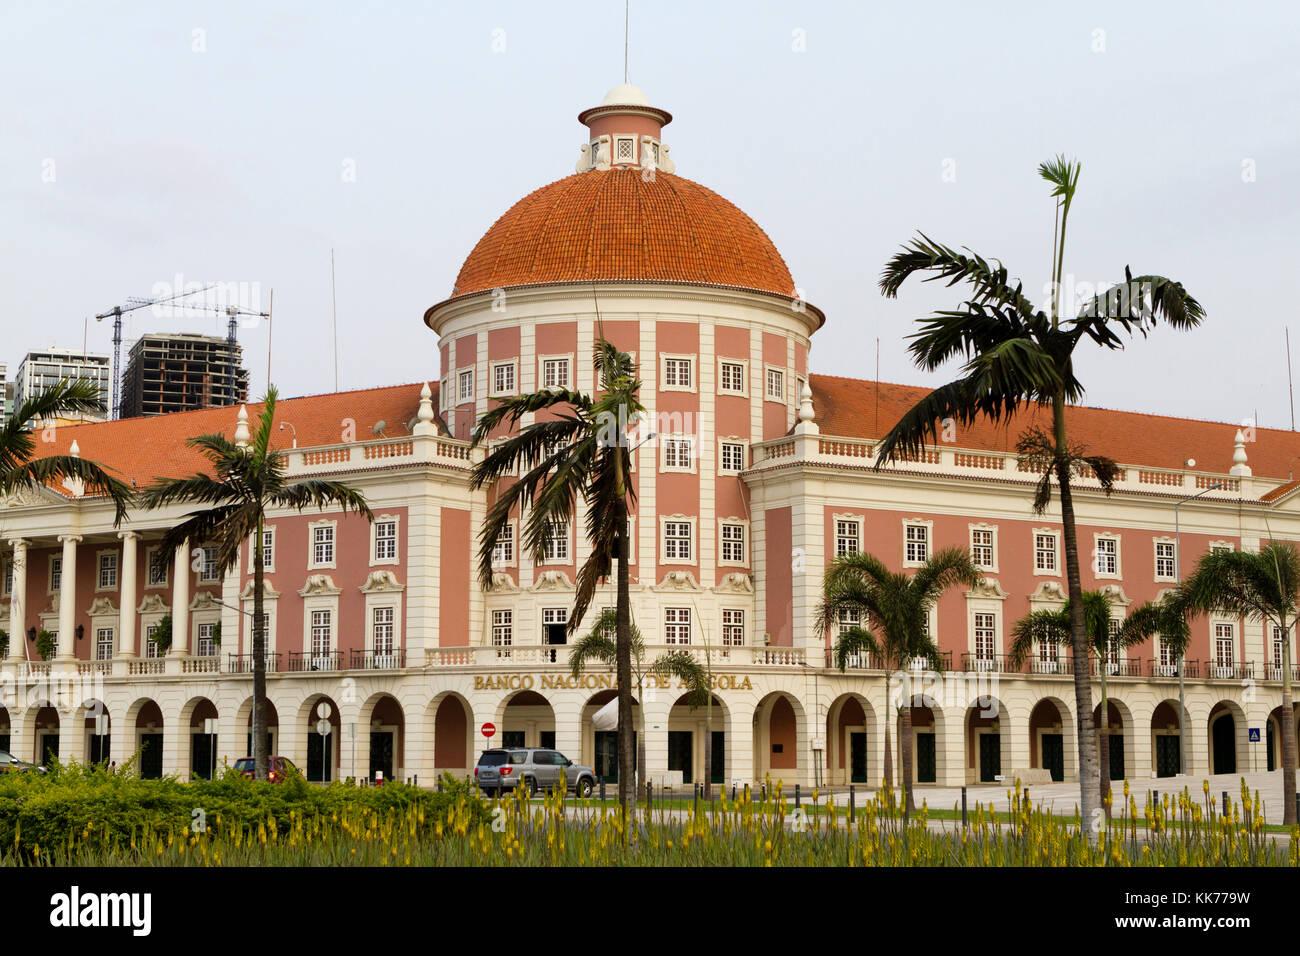 National bank of Angola, Luanda Angola Stock Photo